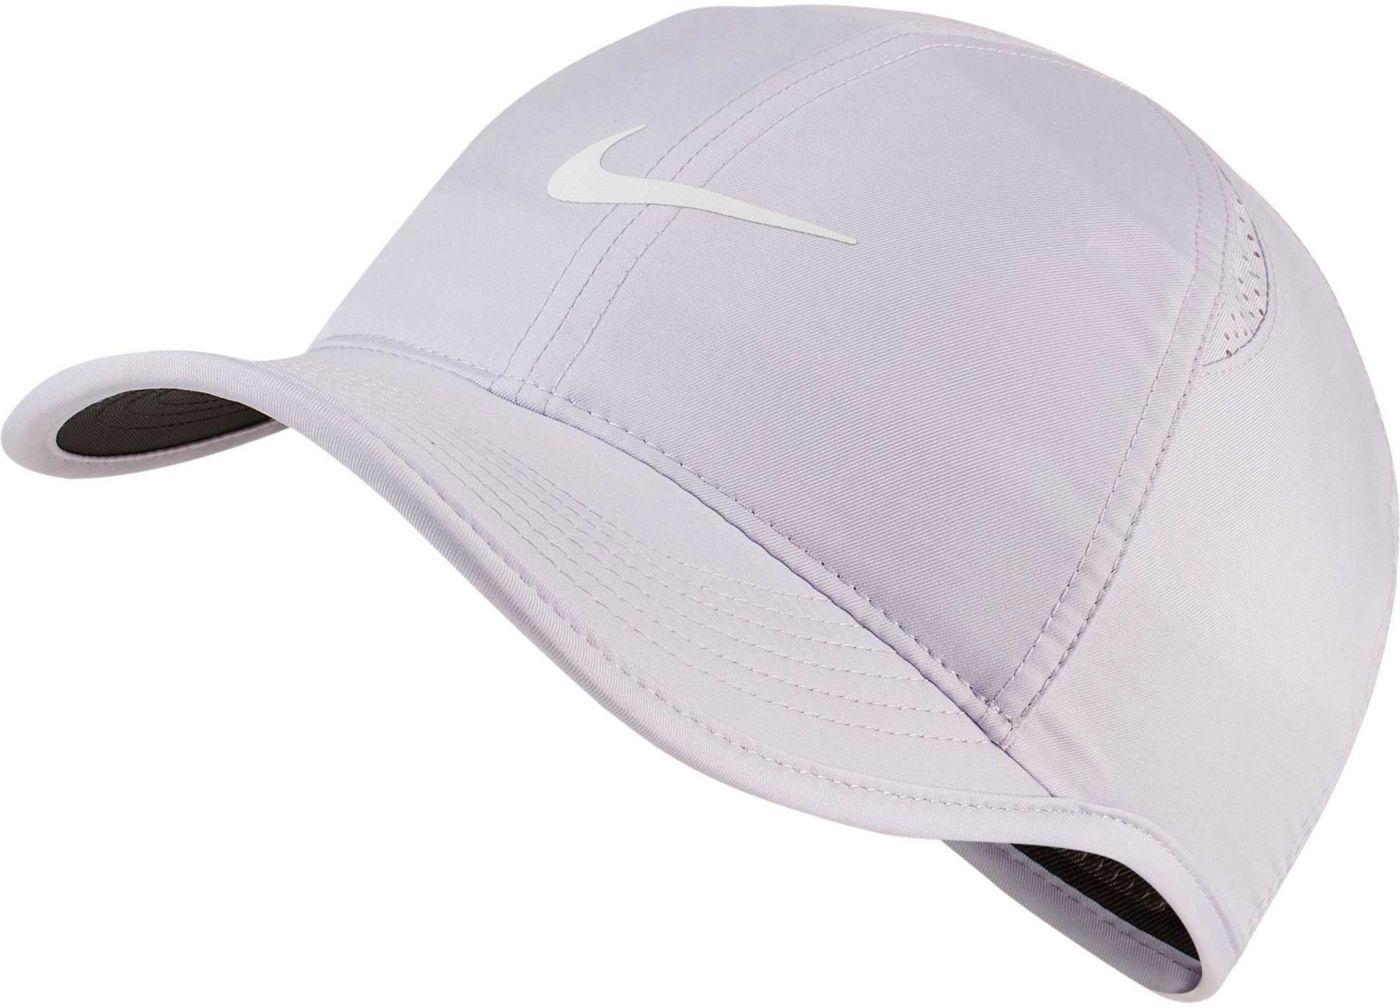 Nike Women's Feather Light Adjustable Hat